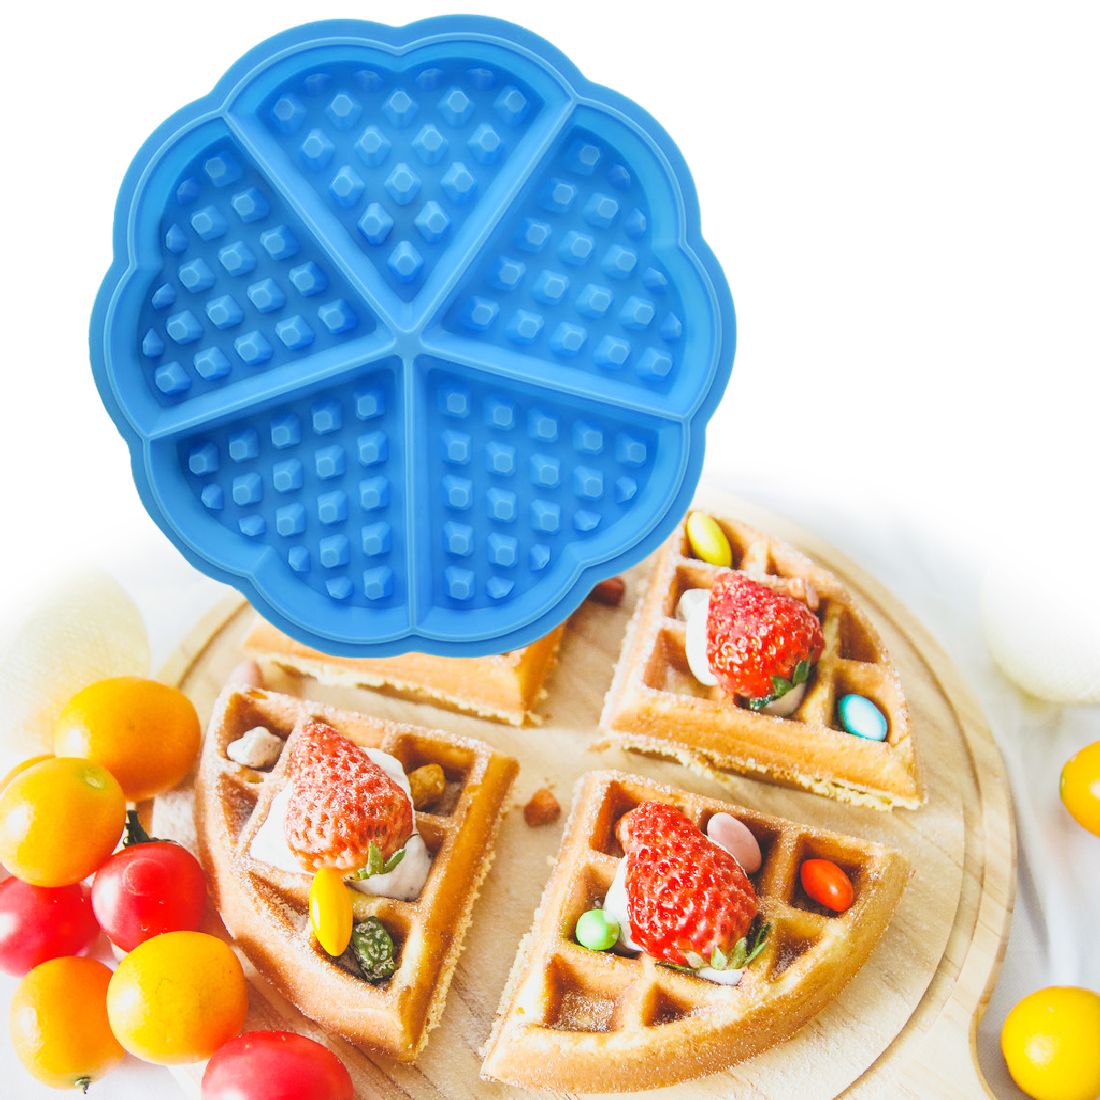 1 ST Fondant Mallen Hartvorm Wafel Siliconen Mal Zeep Chocolade Muffin Cake Stencils Keuken Gebak Bakken Siliconen Formulieren